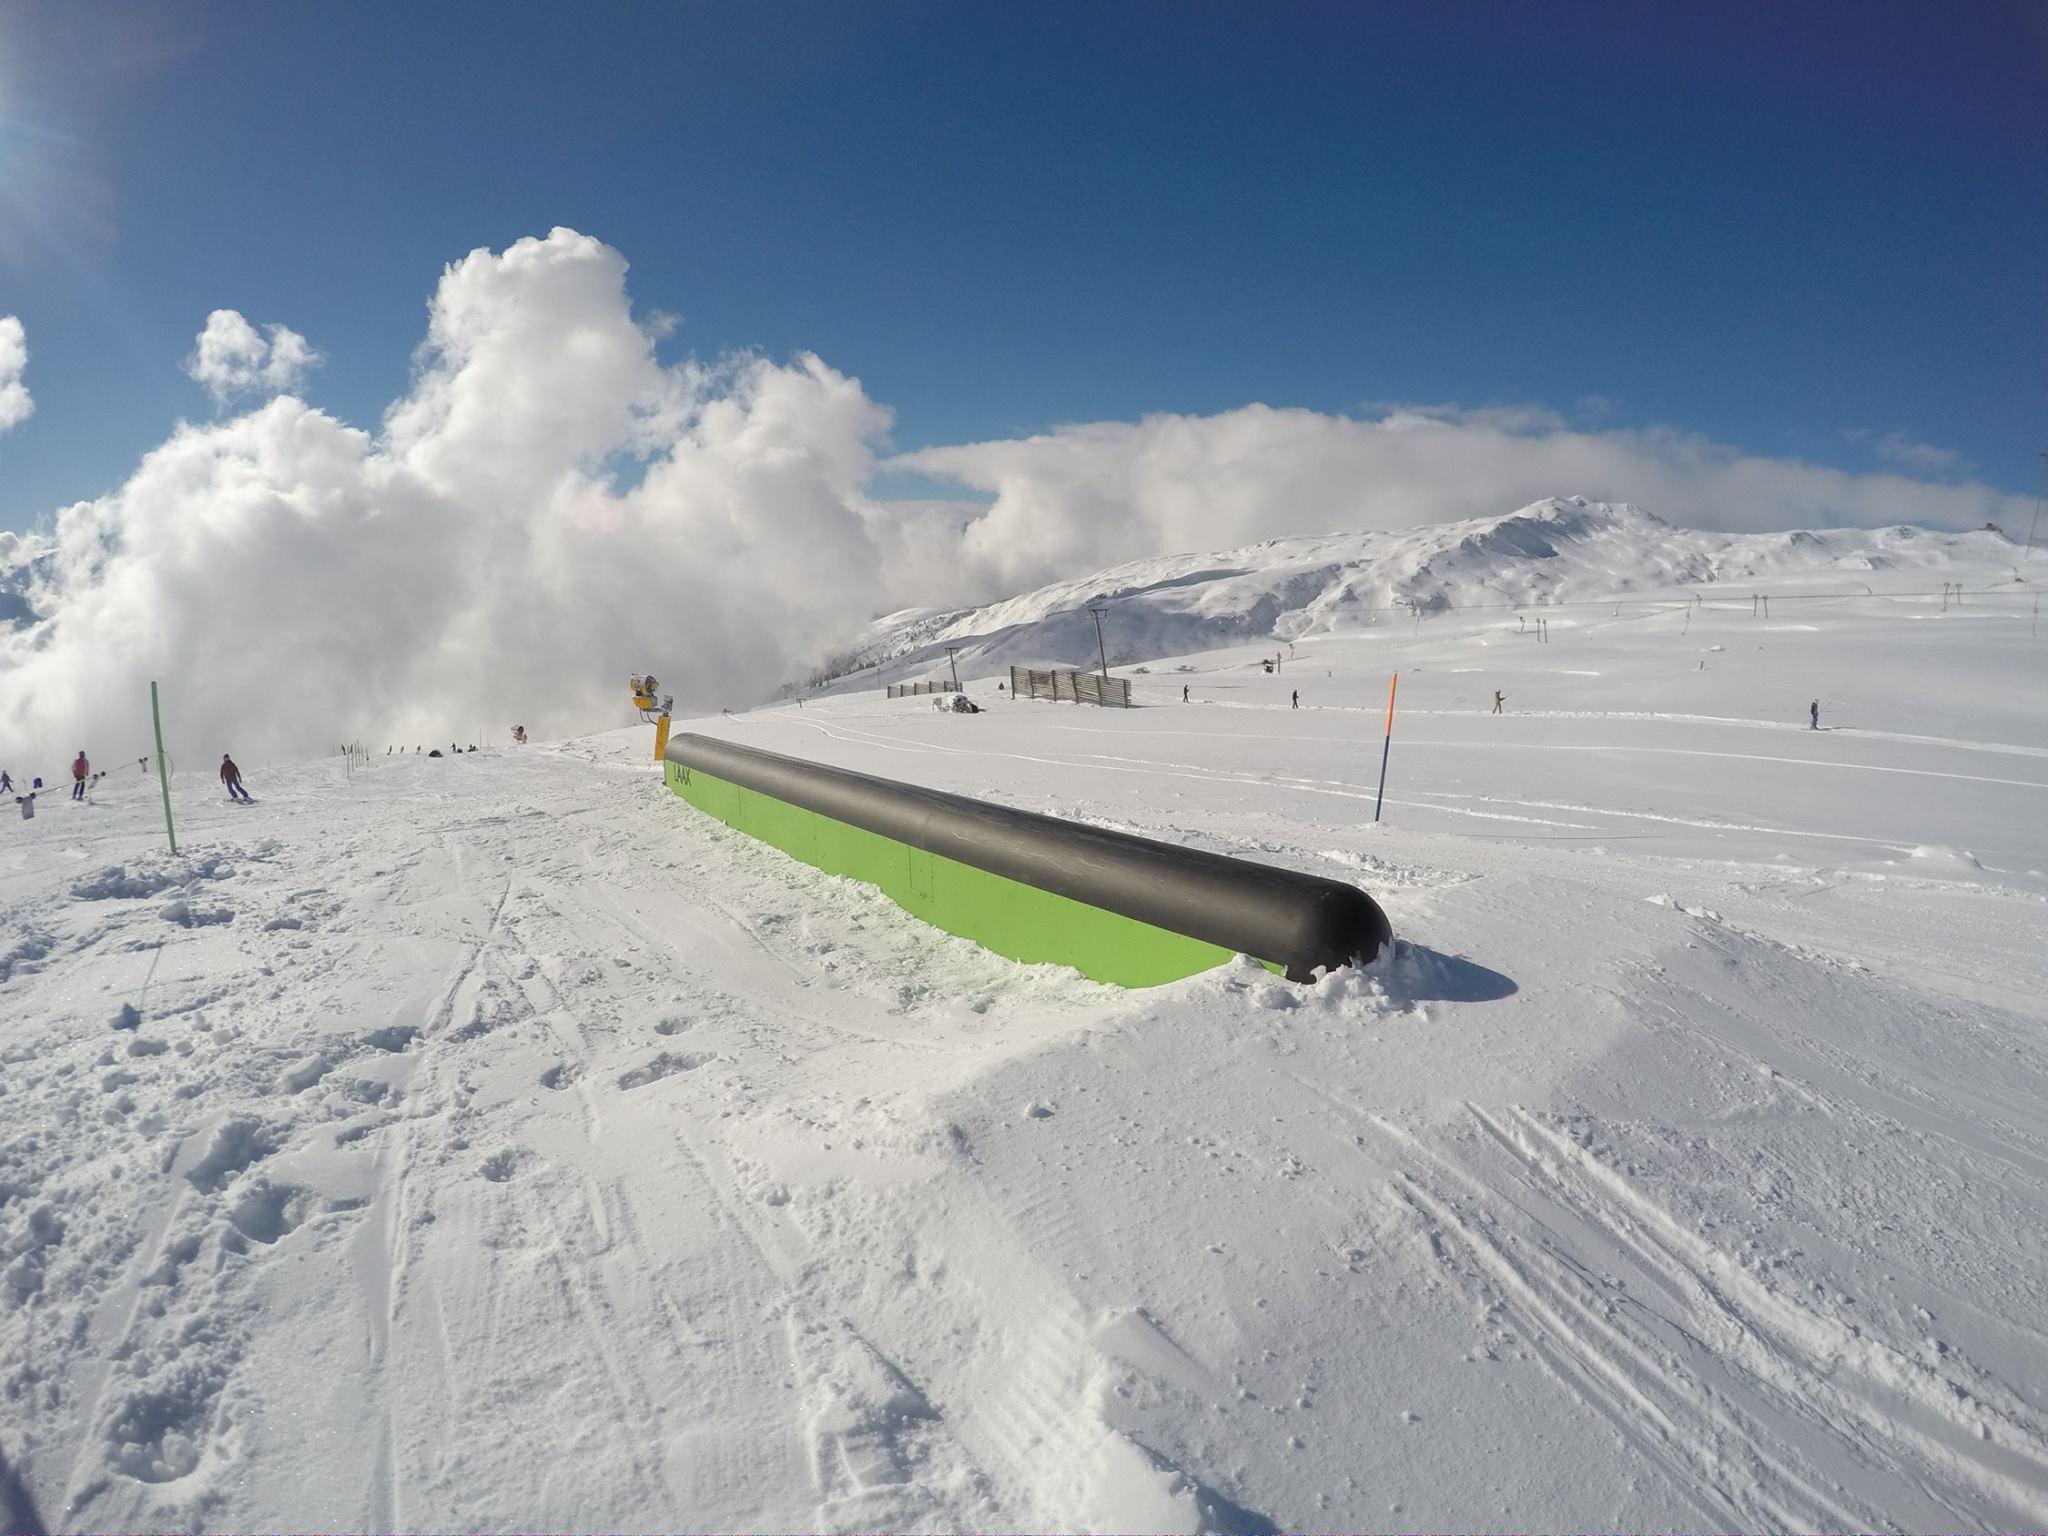 Down Tube - Foto: facebook.com/SnowparkLAAX